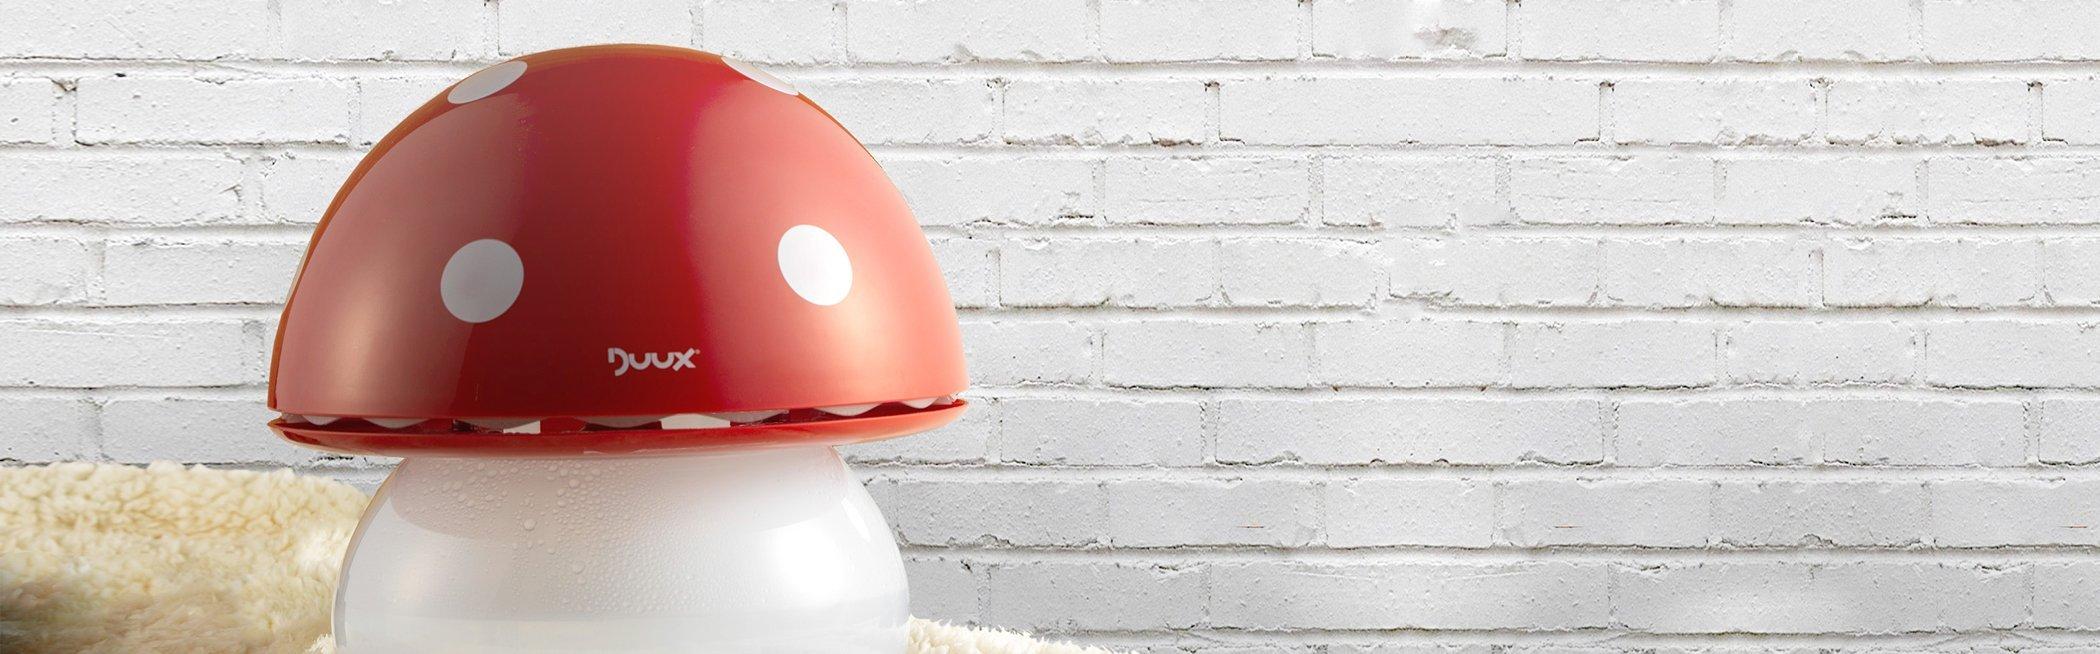 Duux Ultrasonic Air Humidifier - Red Mushroom